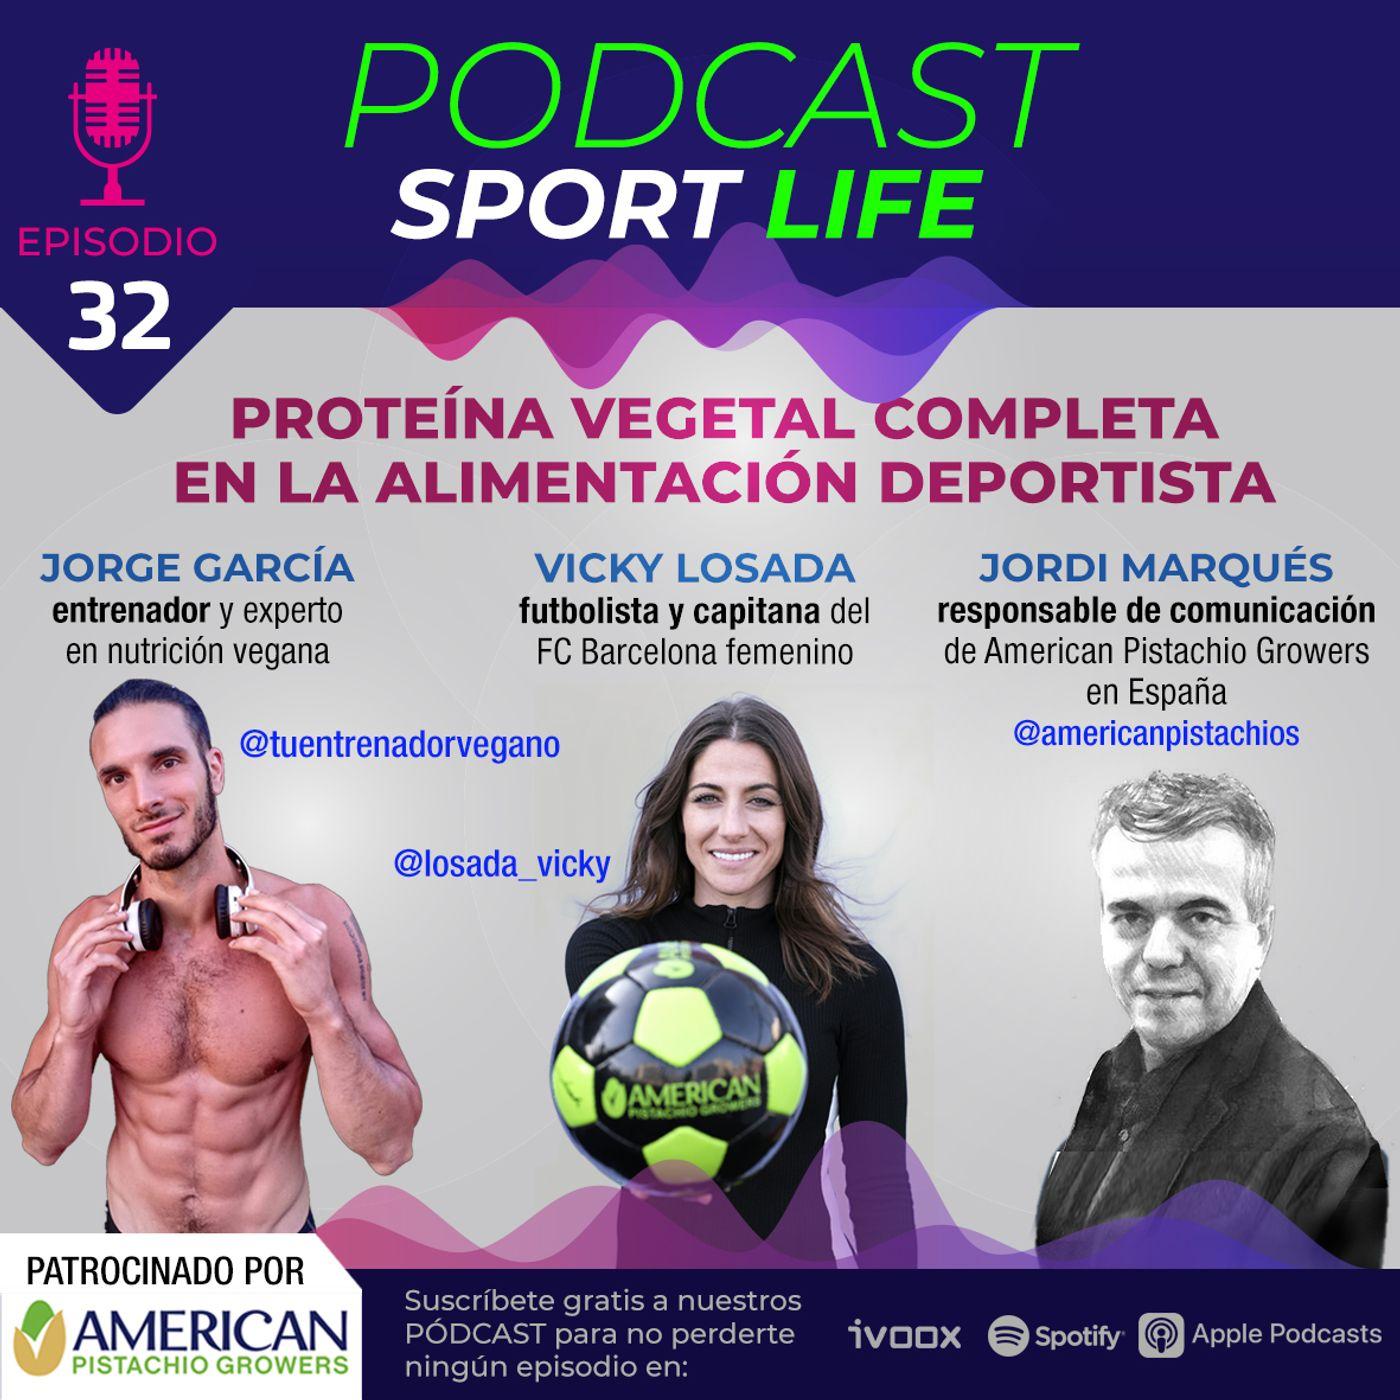 PODCAST SPL #32 - Proteína Vegetal Completa en la dieta deportista